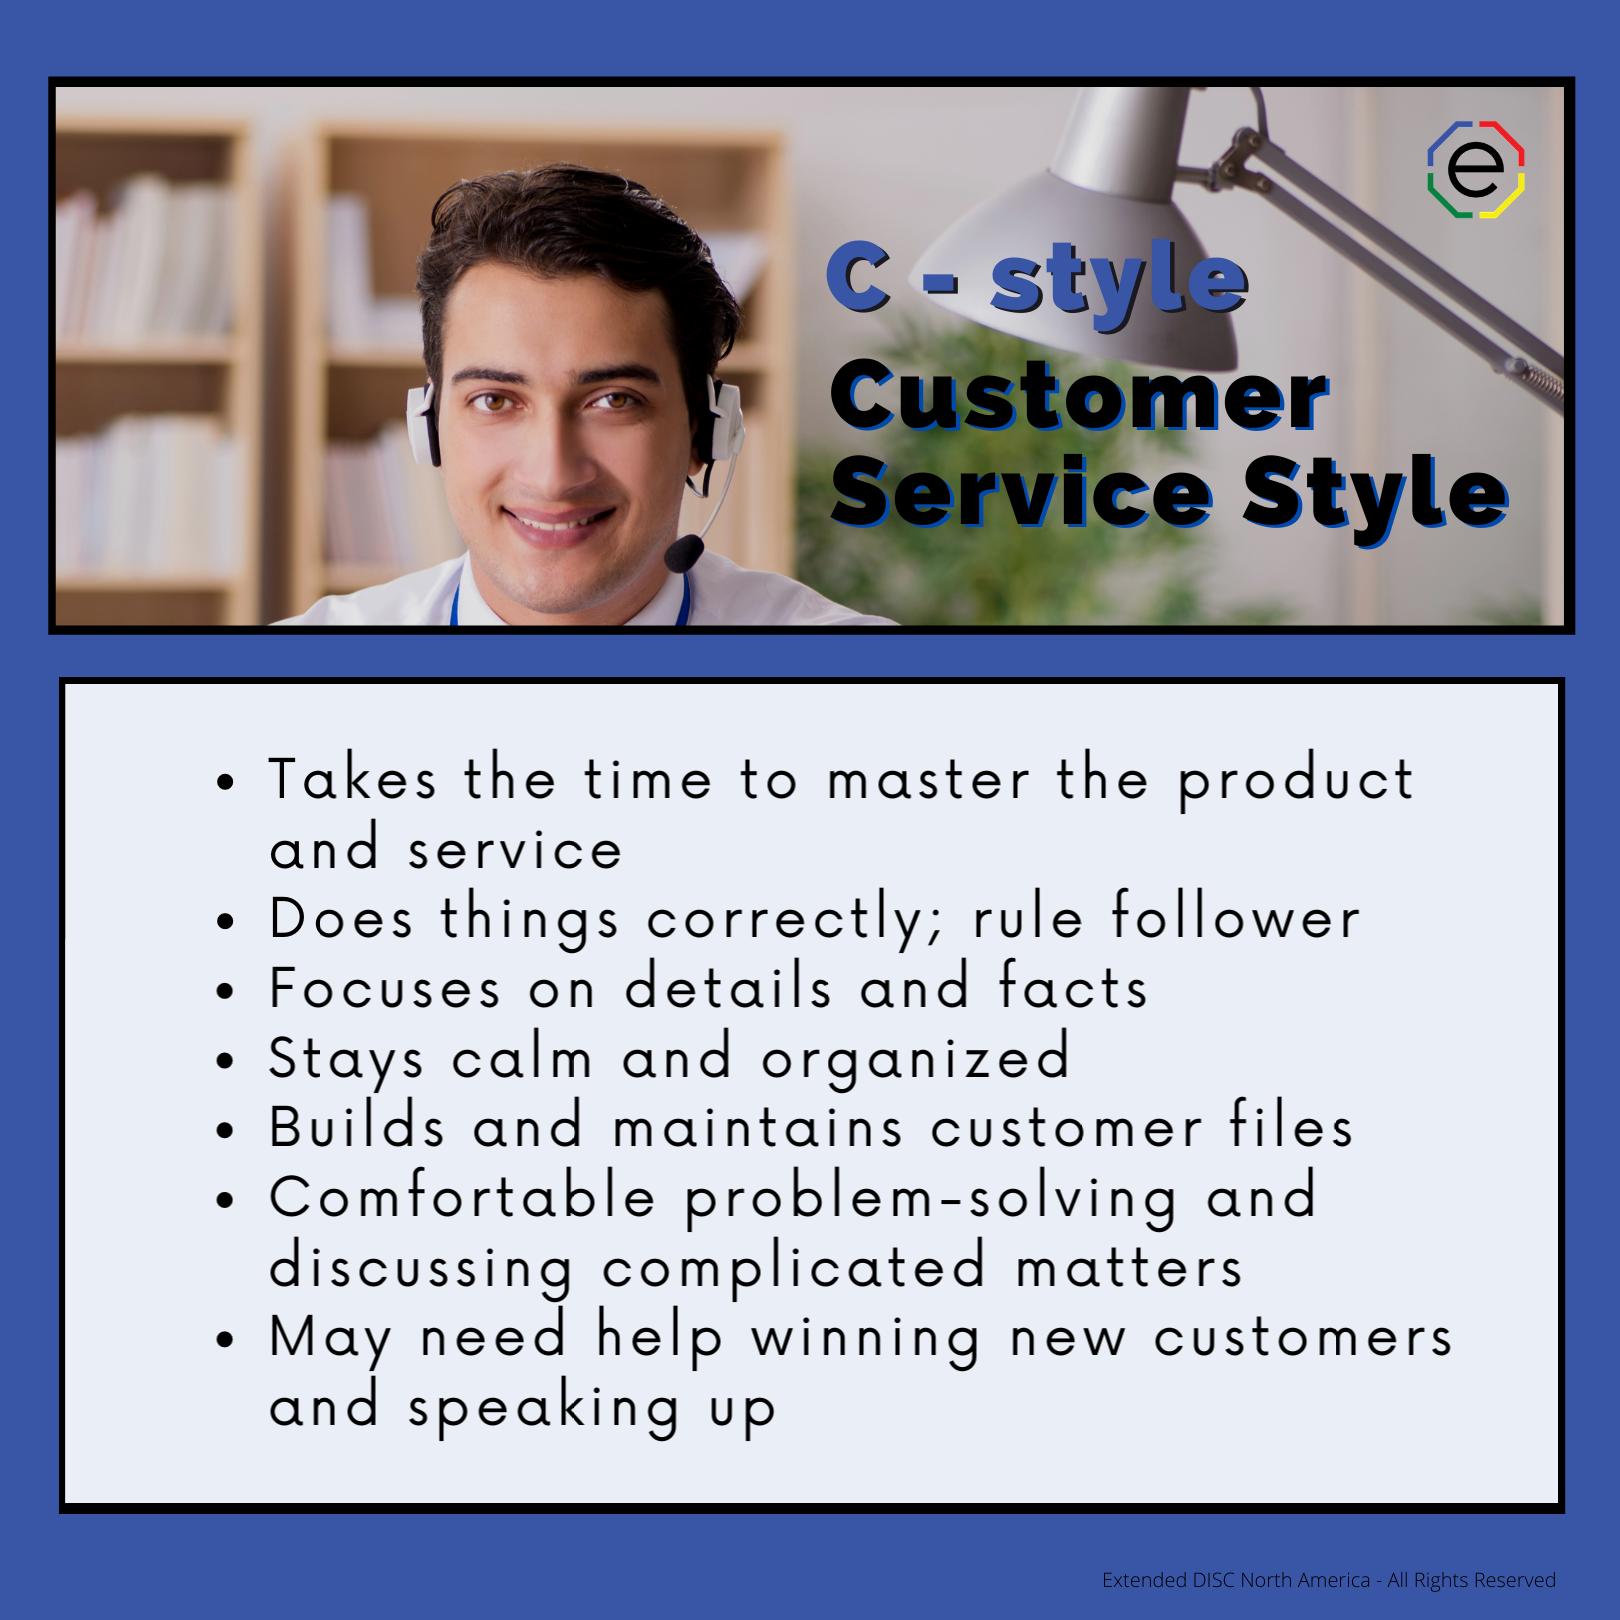 C-style Customer Service Styles